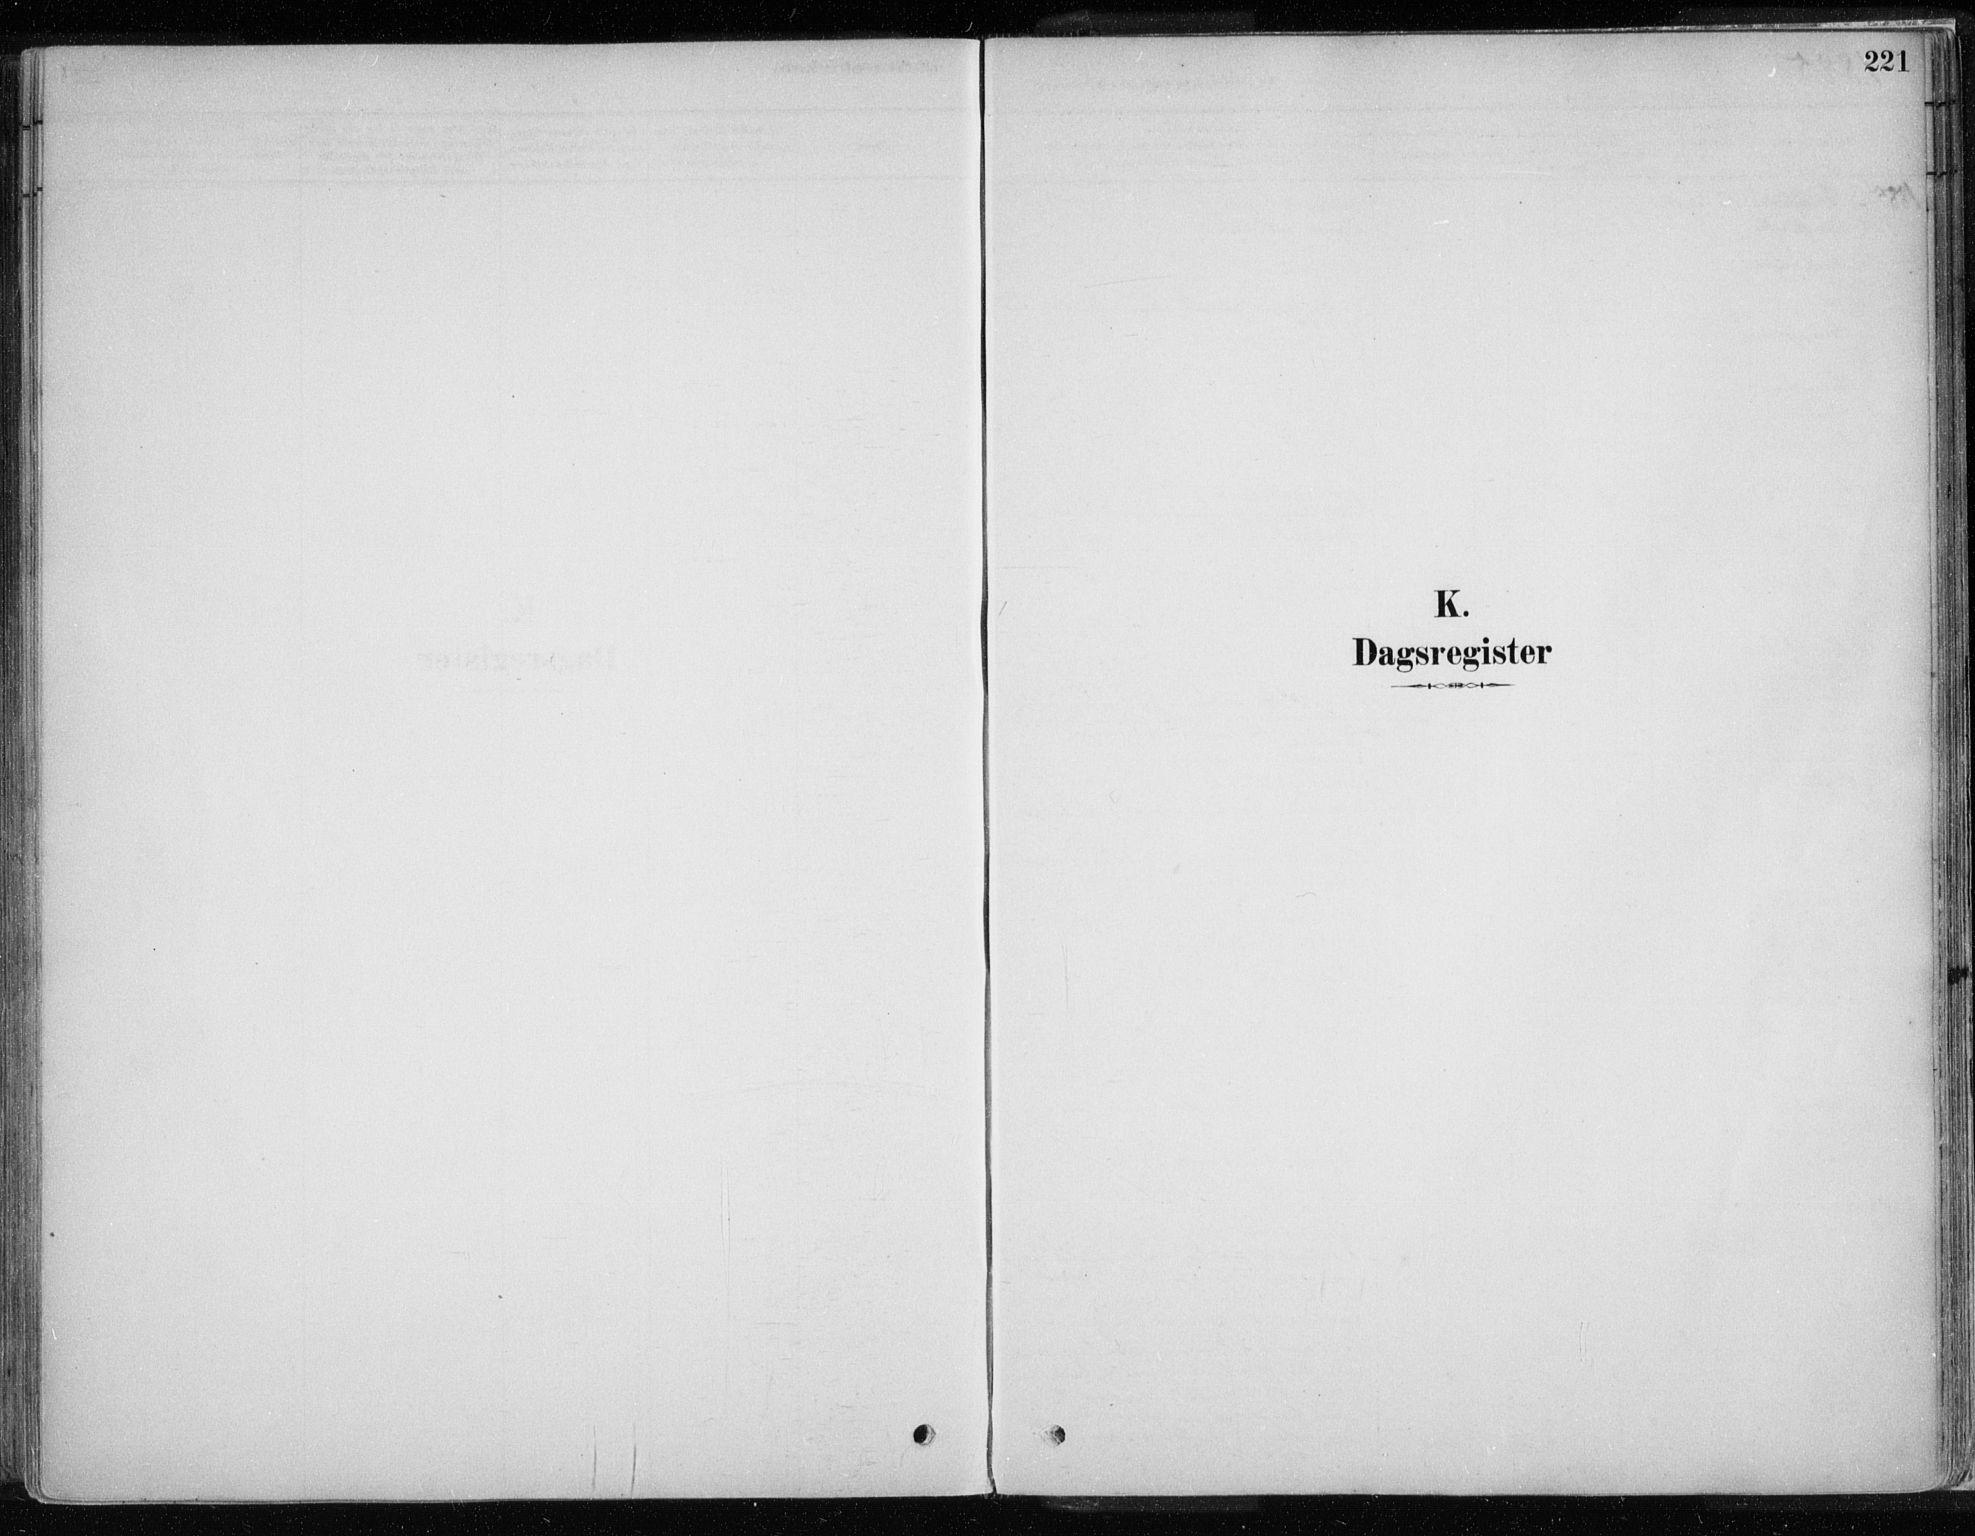 SATØ, Karasjok sokneprestkontor, H/Ha/L0002kirke: Ministerialbok nr. 2, 1885-1906, s. 221